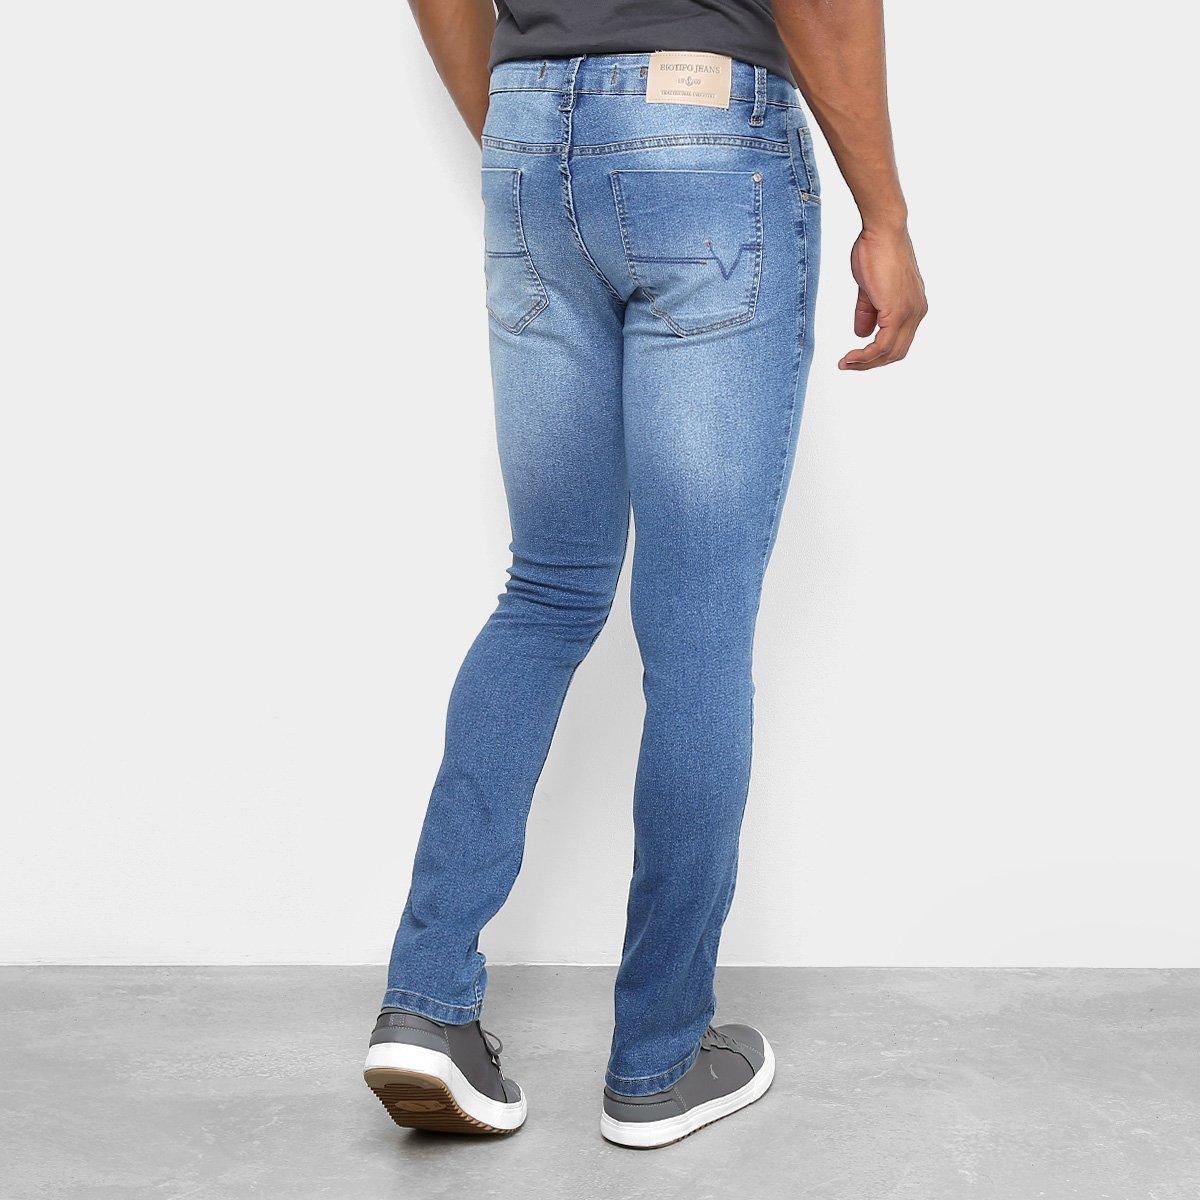 5888631b4e Calça Jeans Skinny Biotipo Estonada Masculina - Azul Claro - Compre ...